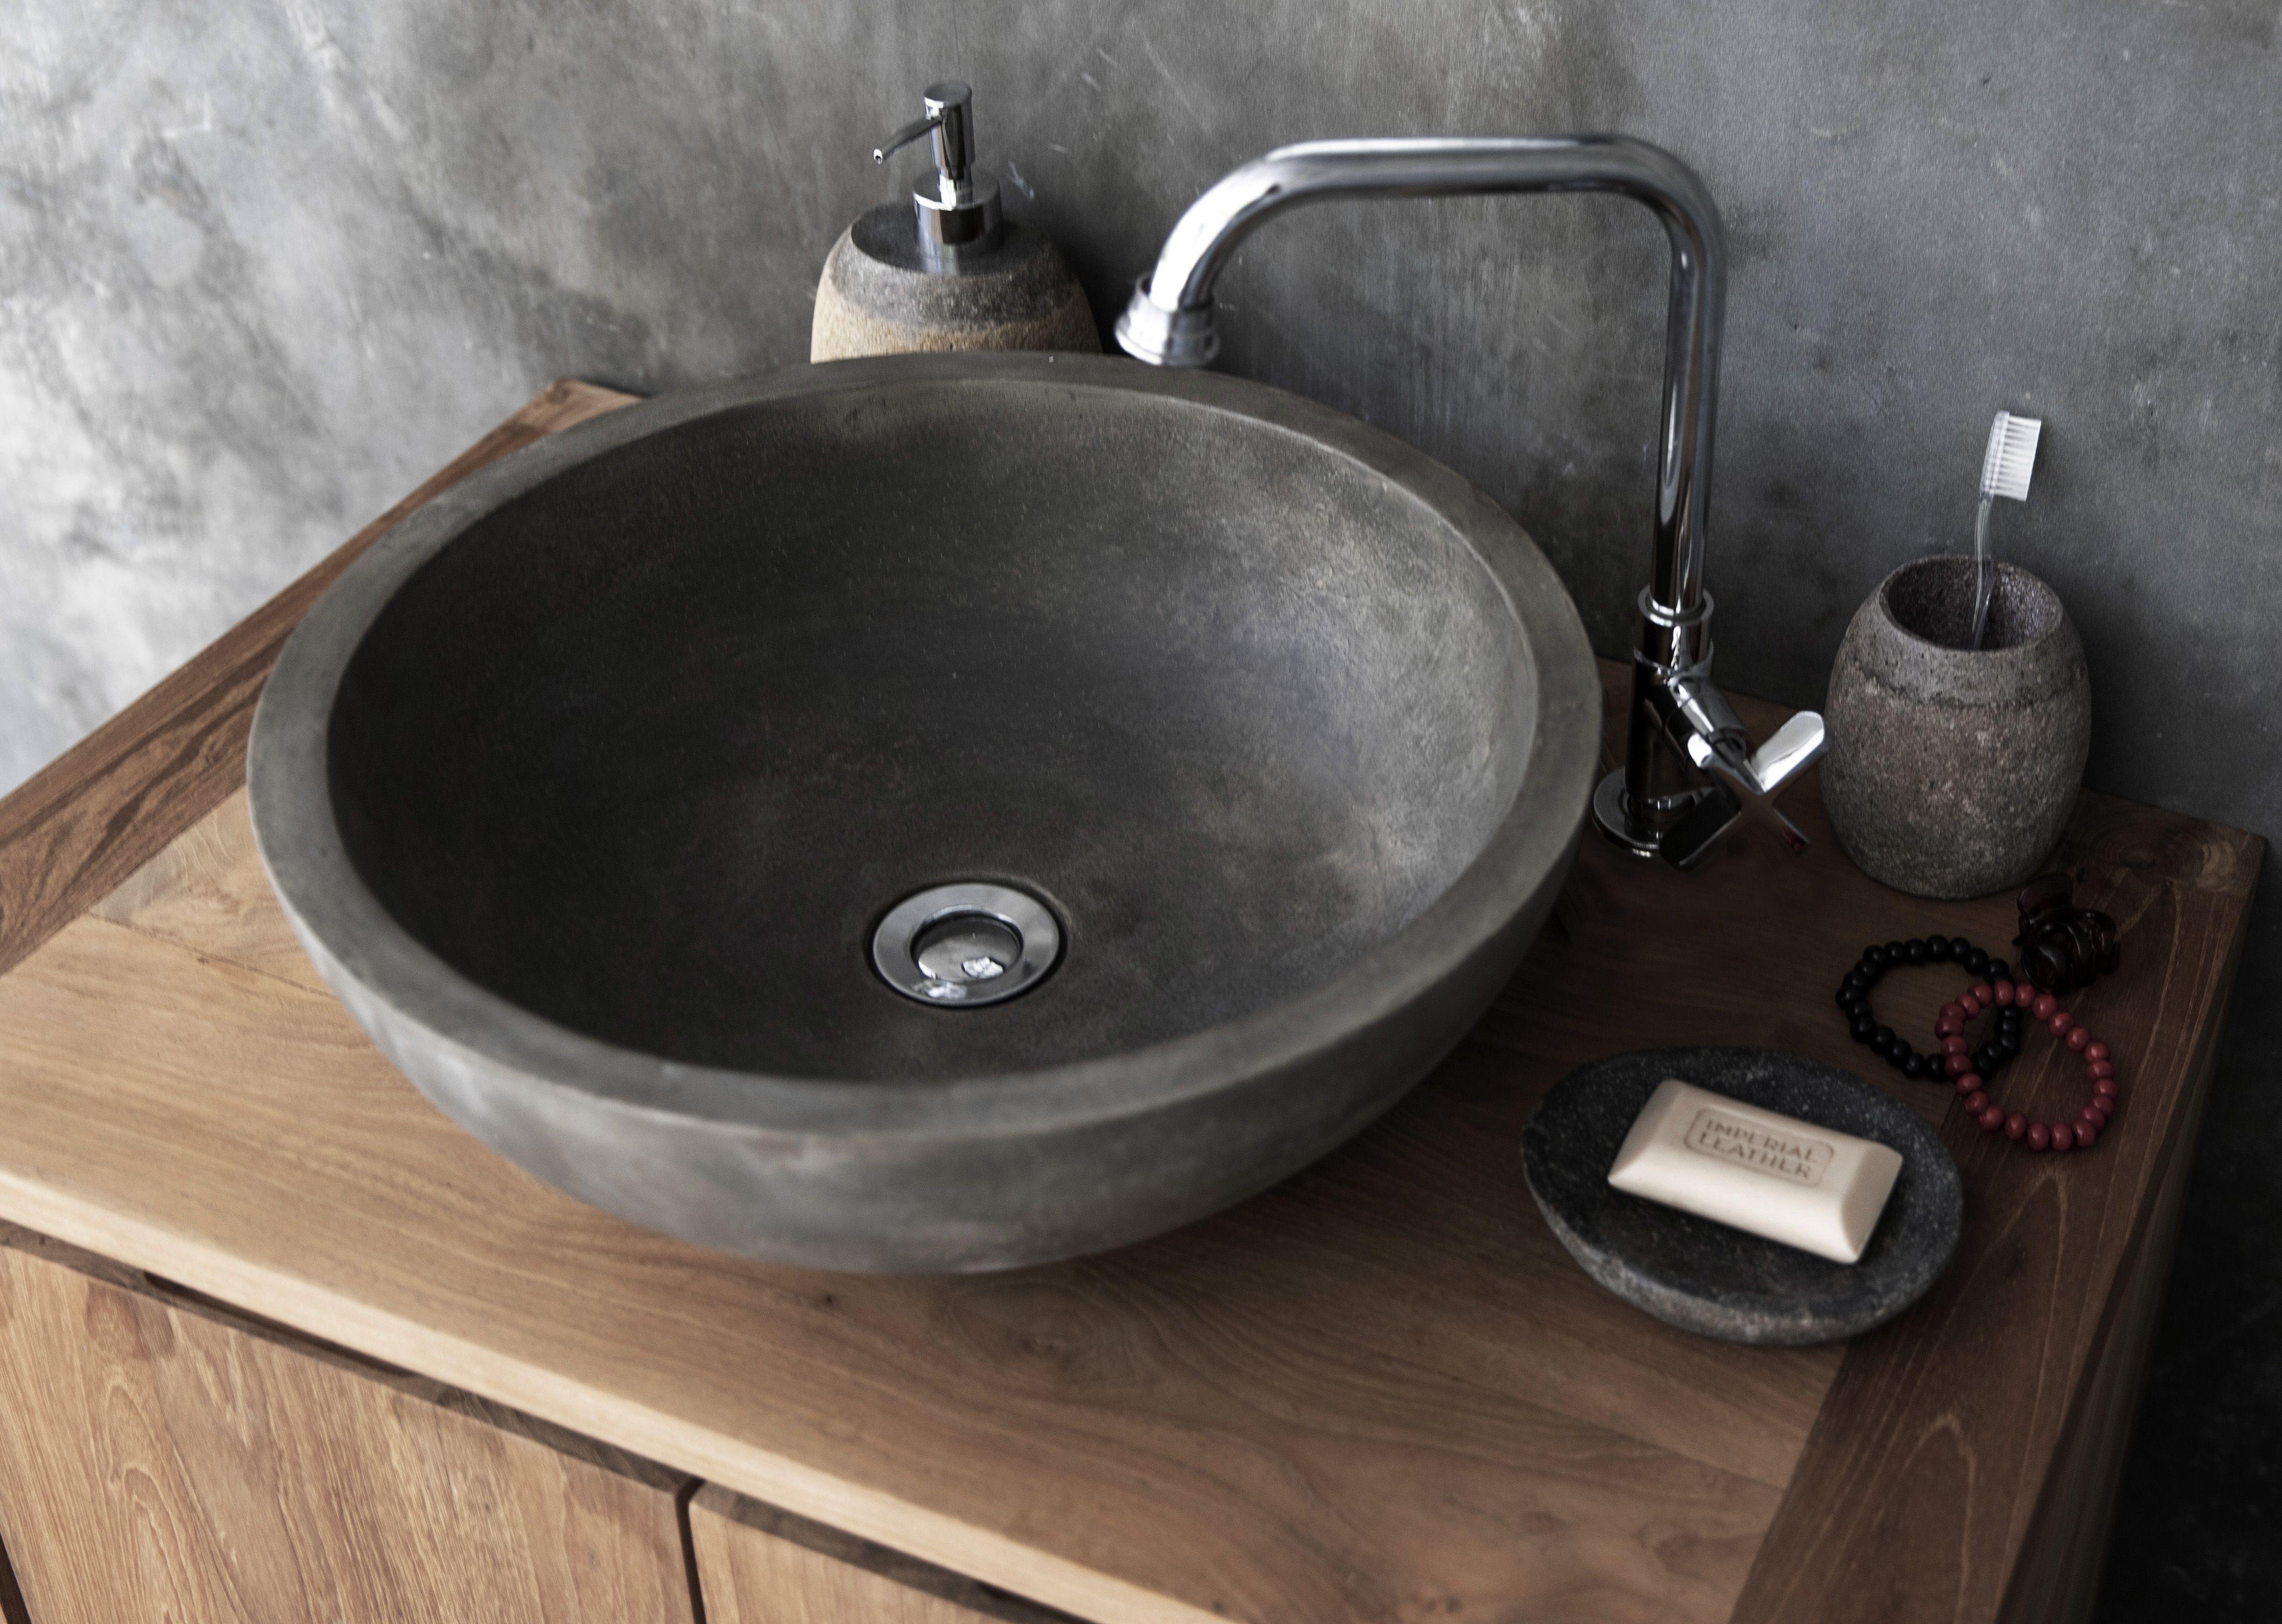 Conspire Collection Of Modern Design Concrete Basins Concrete Bathroom Bathroom Sink Concrete Basin Bathroom basin design ideas